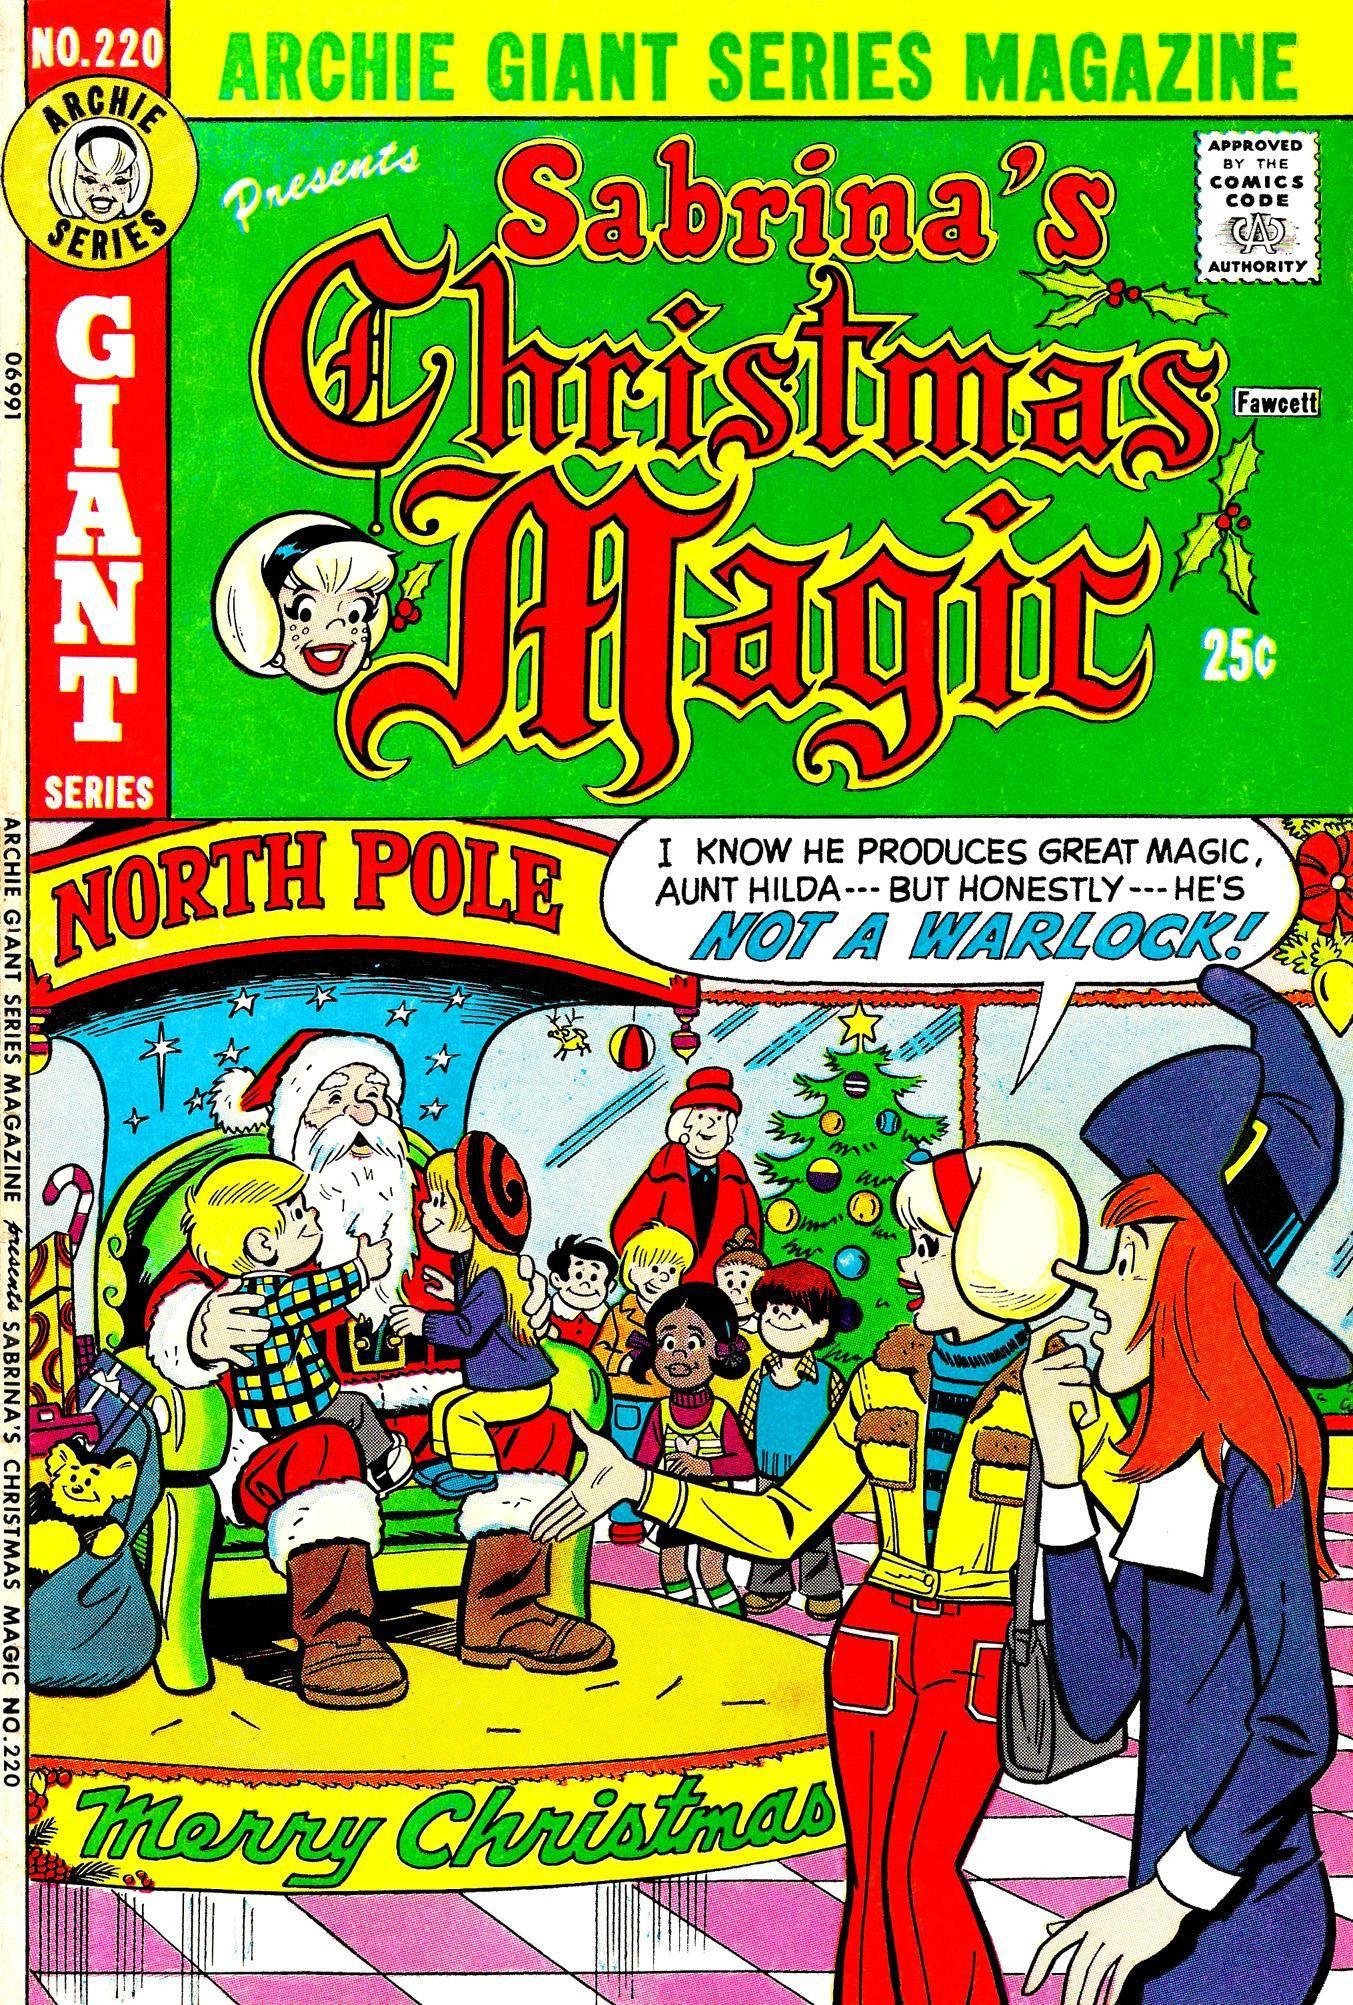 Archie Giant Series Magazine 220 Sabrinas Christmas Magic 1973 c2c trango